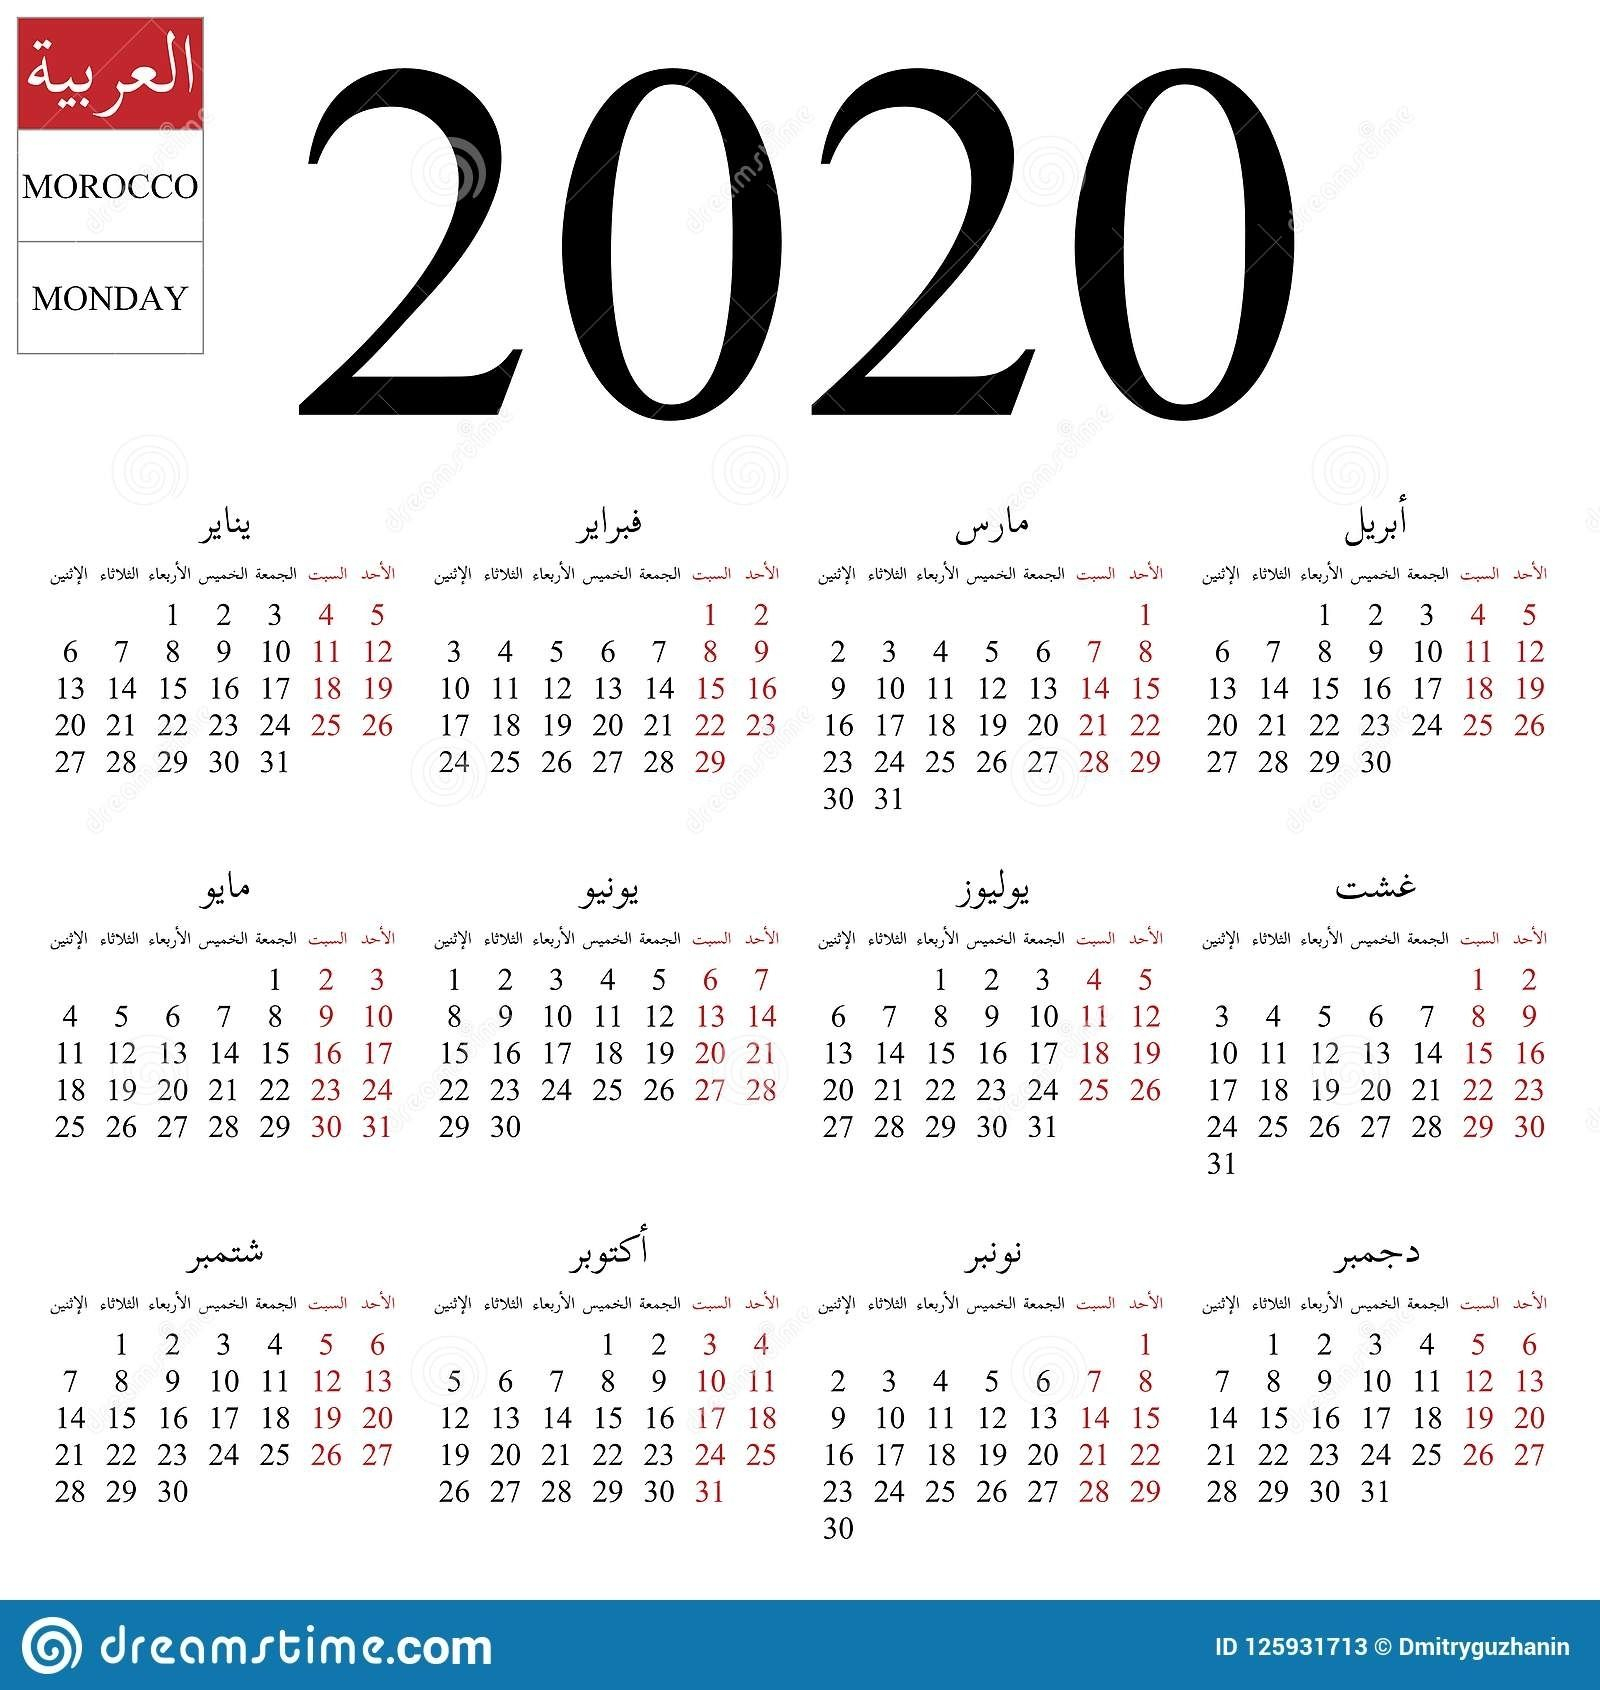 2020 Calendar Sunday Through Saturday In 2020 | Free